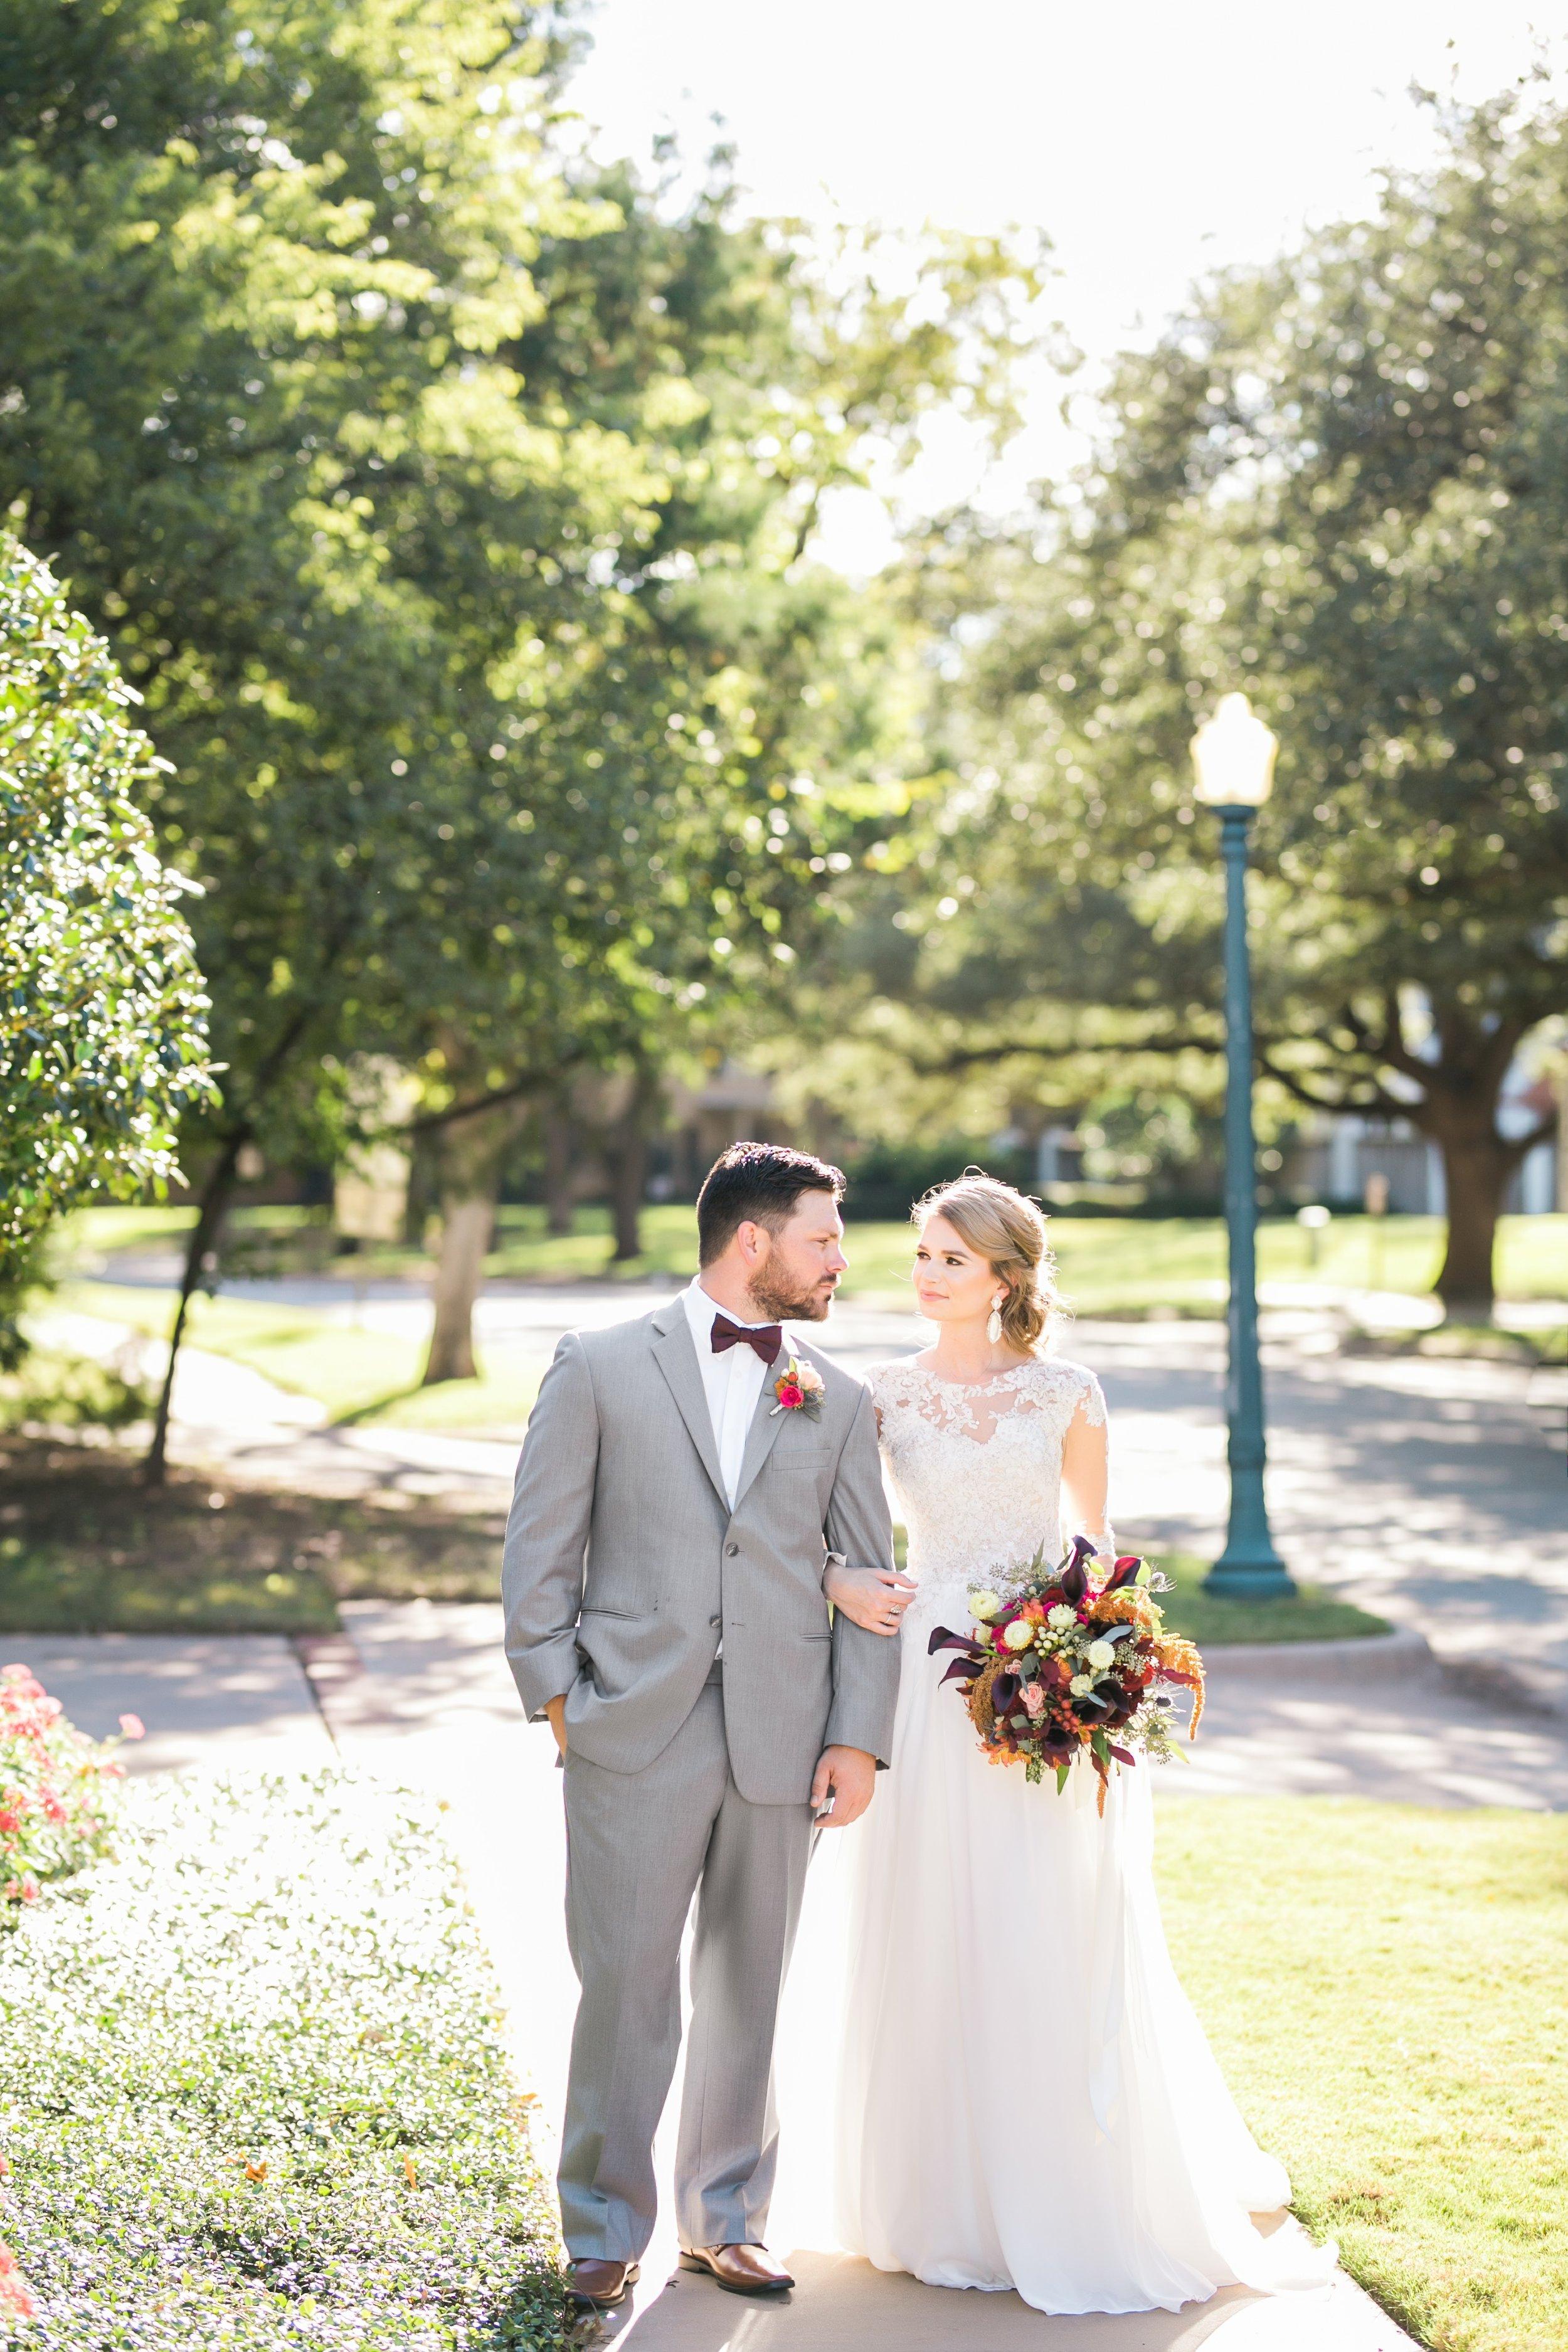 Roberson-Wedding-The-Forum-Lauren-Pinson-Wedding-Photography-Wichita-Falls-Texas-038.jpg